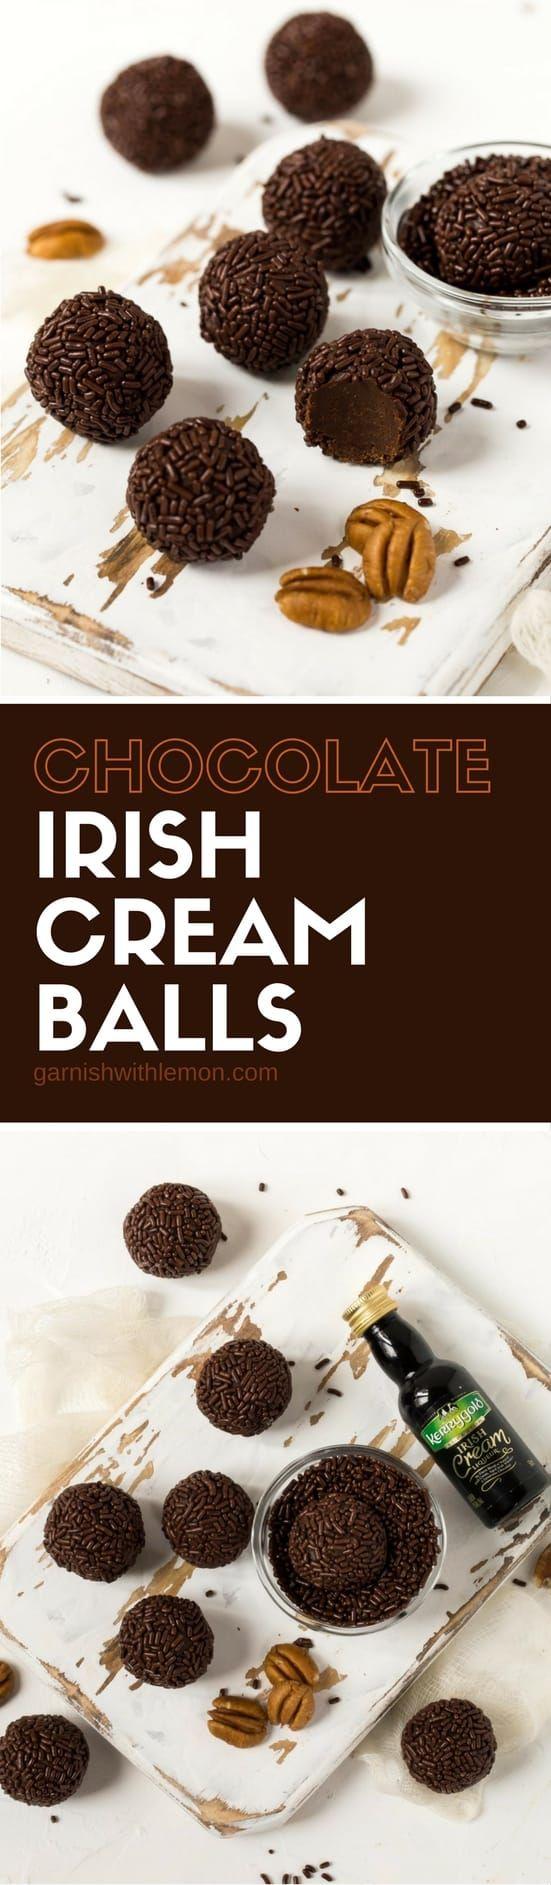 Homemade food gifts don't get much more decadent than these no-bake Dark Chocolate Irish Cream Balls.